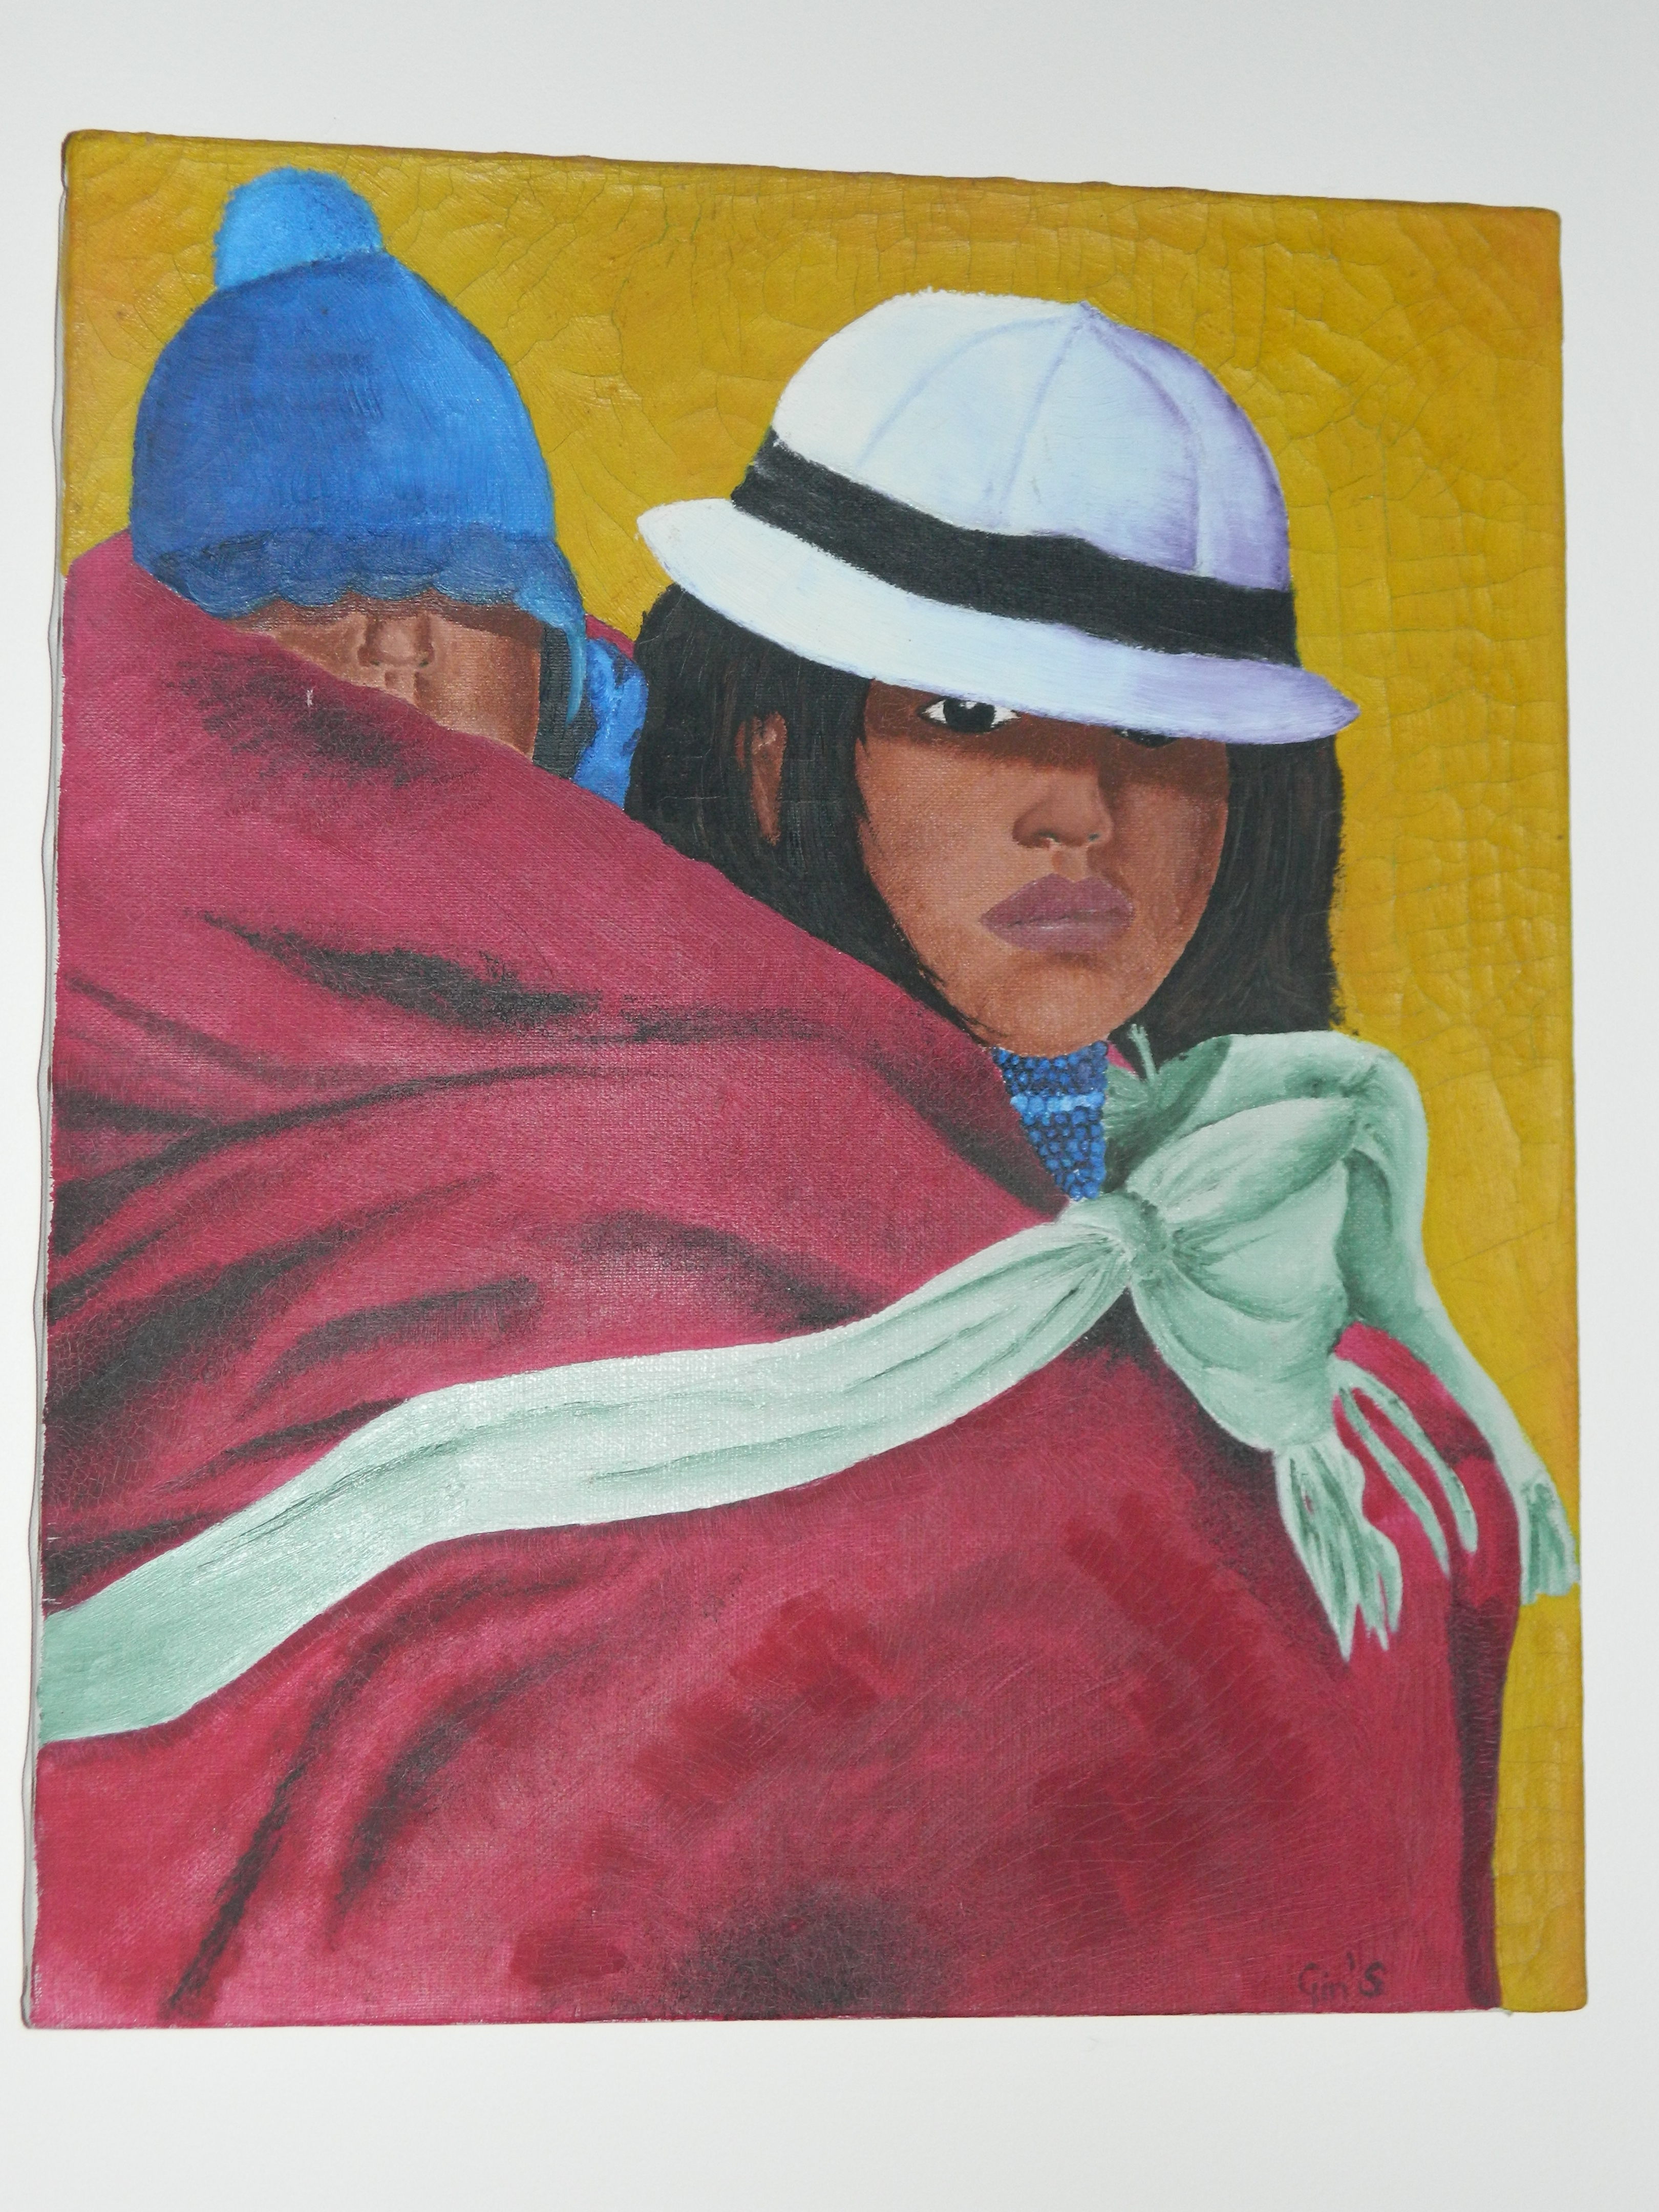 South American woman, 2000